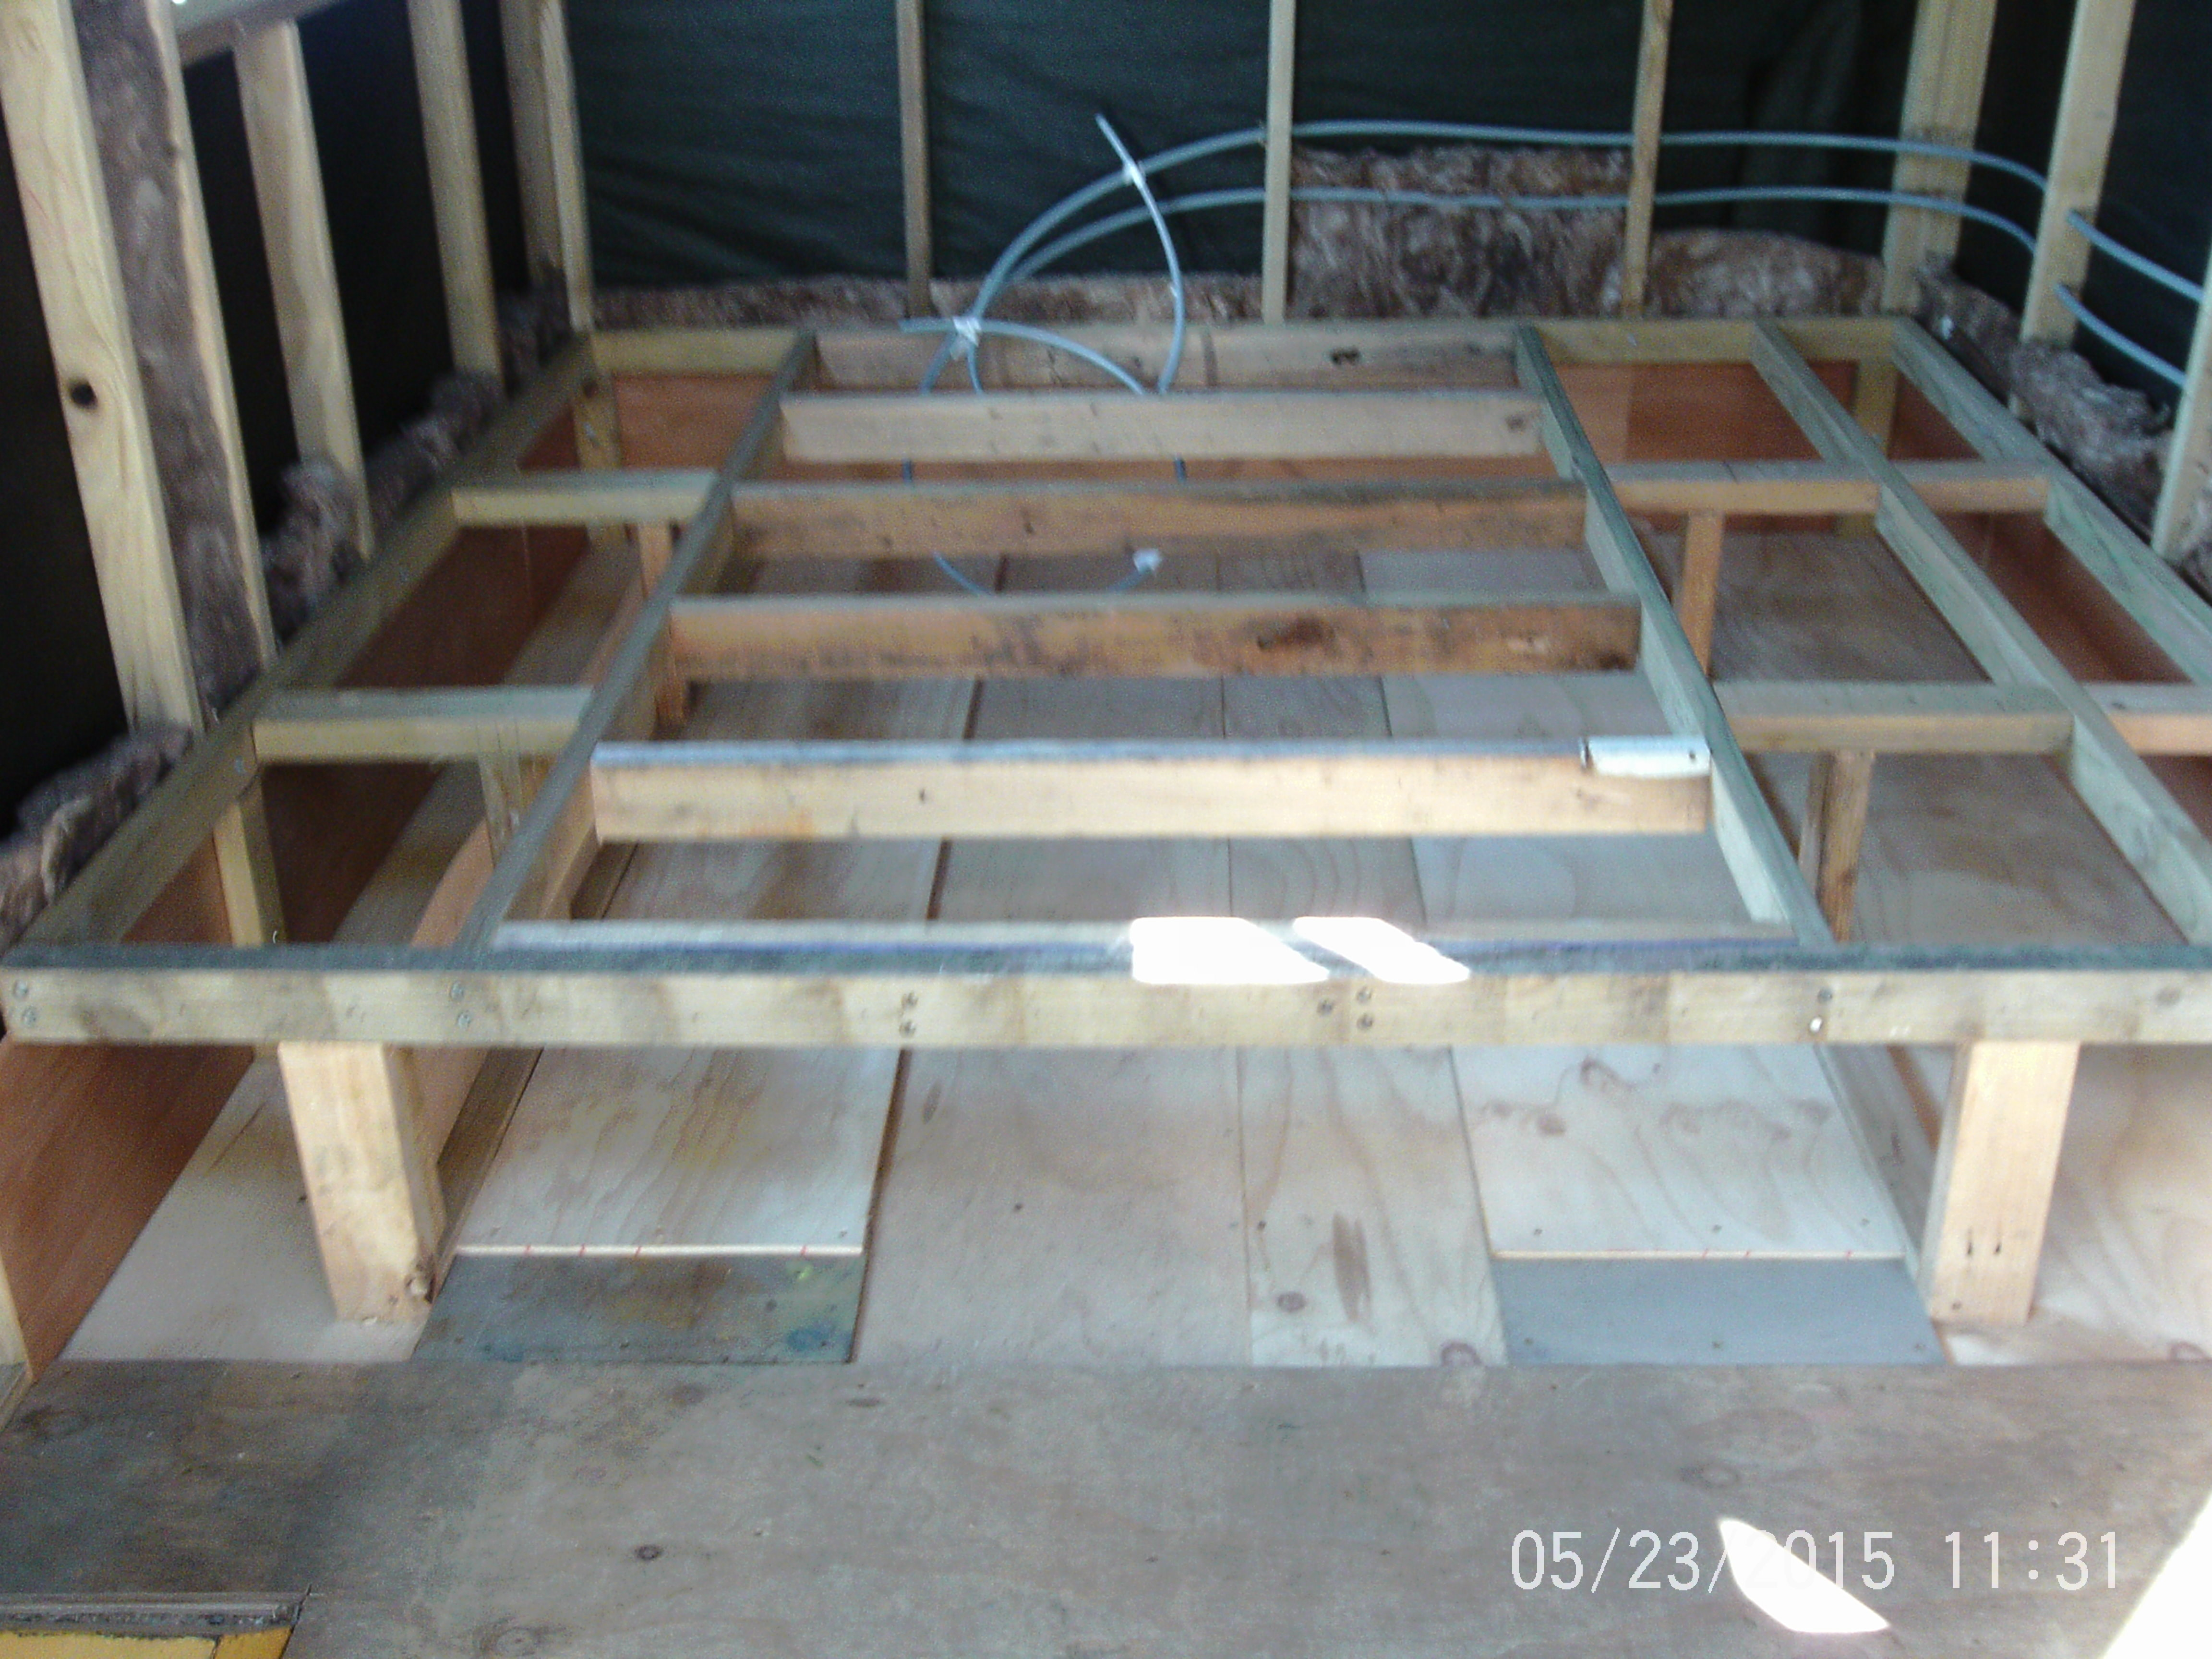 Underfloor Bed Storage South Island Tiny House Chch Nz